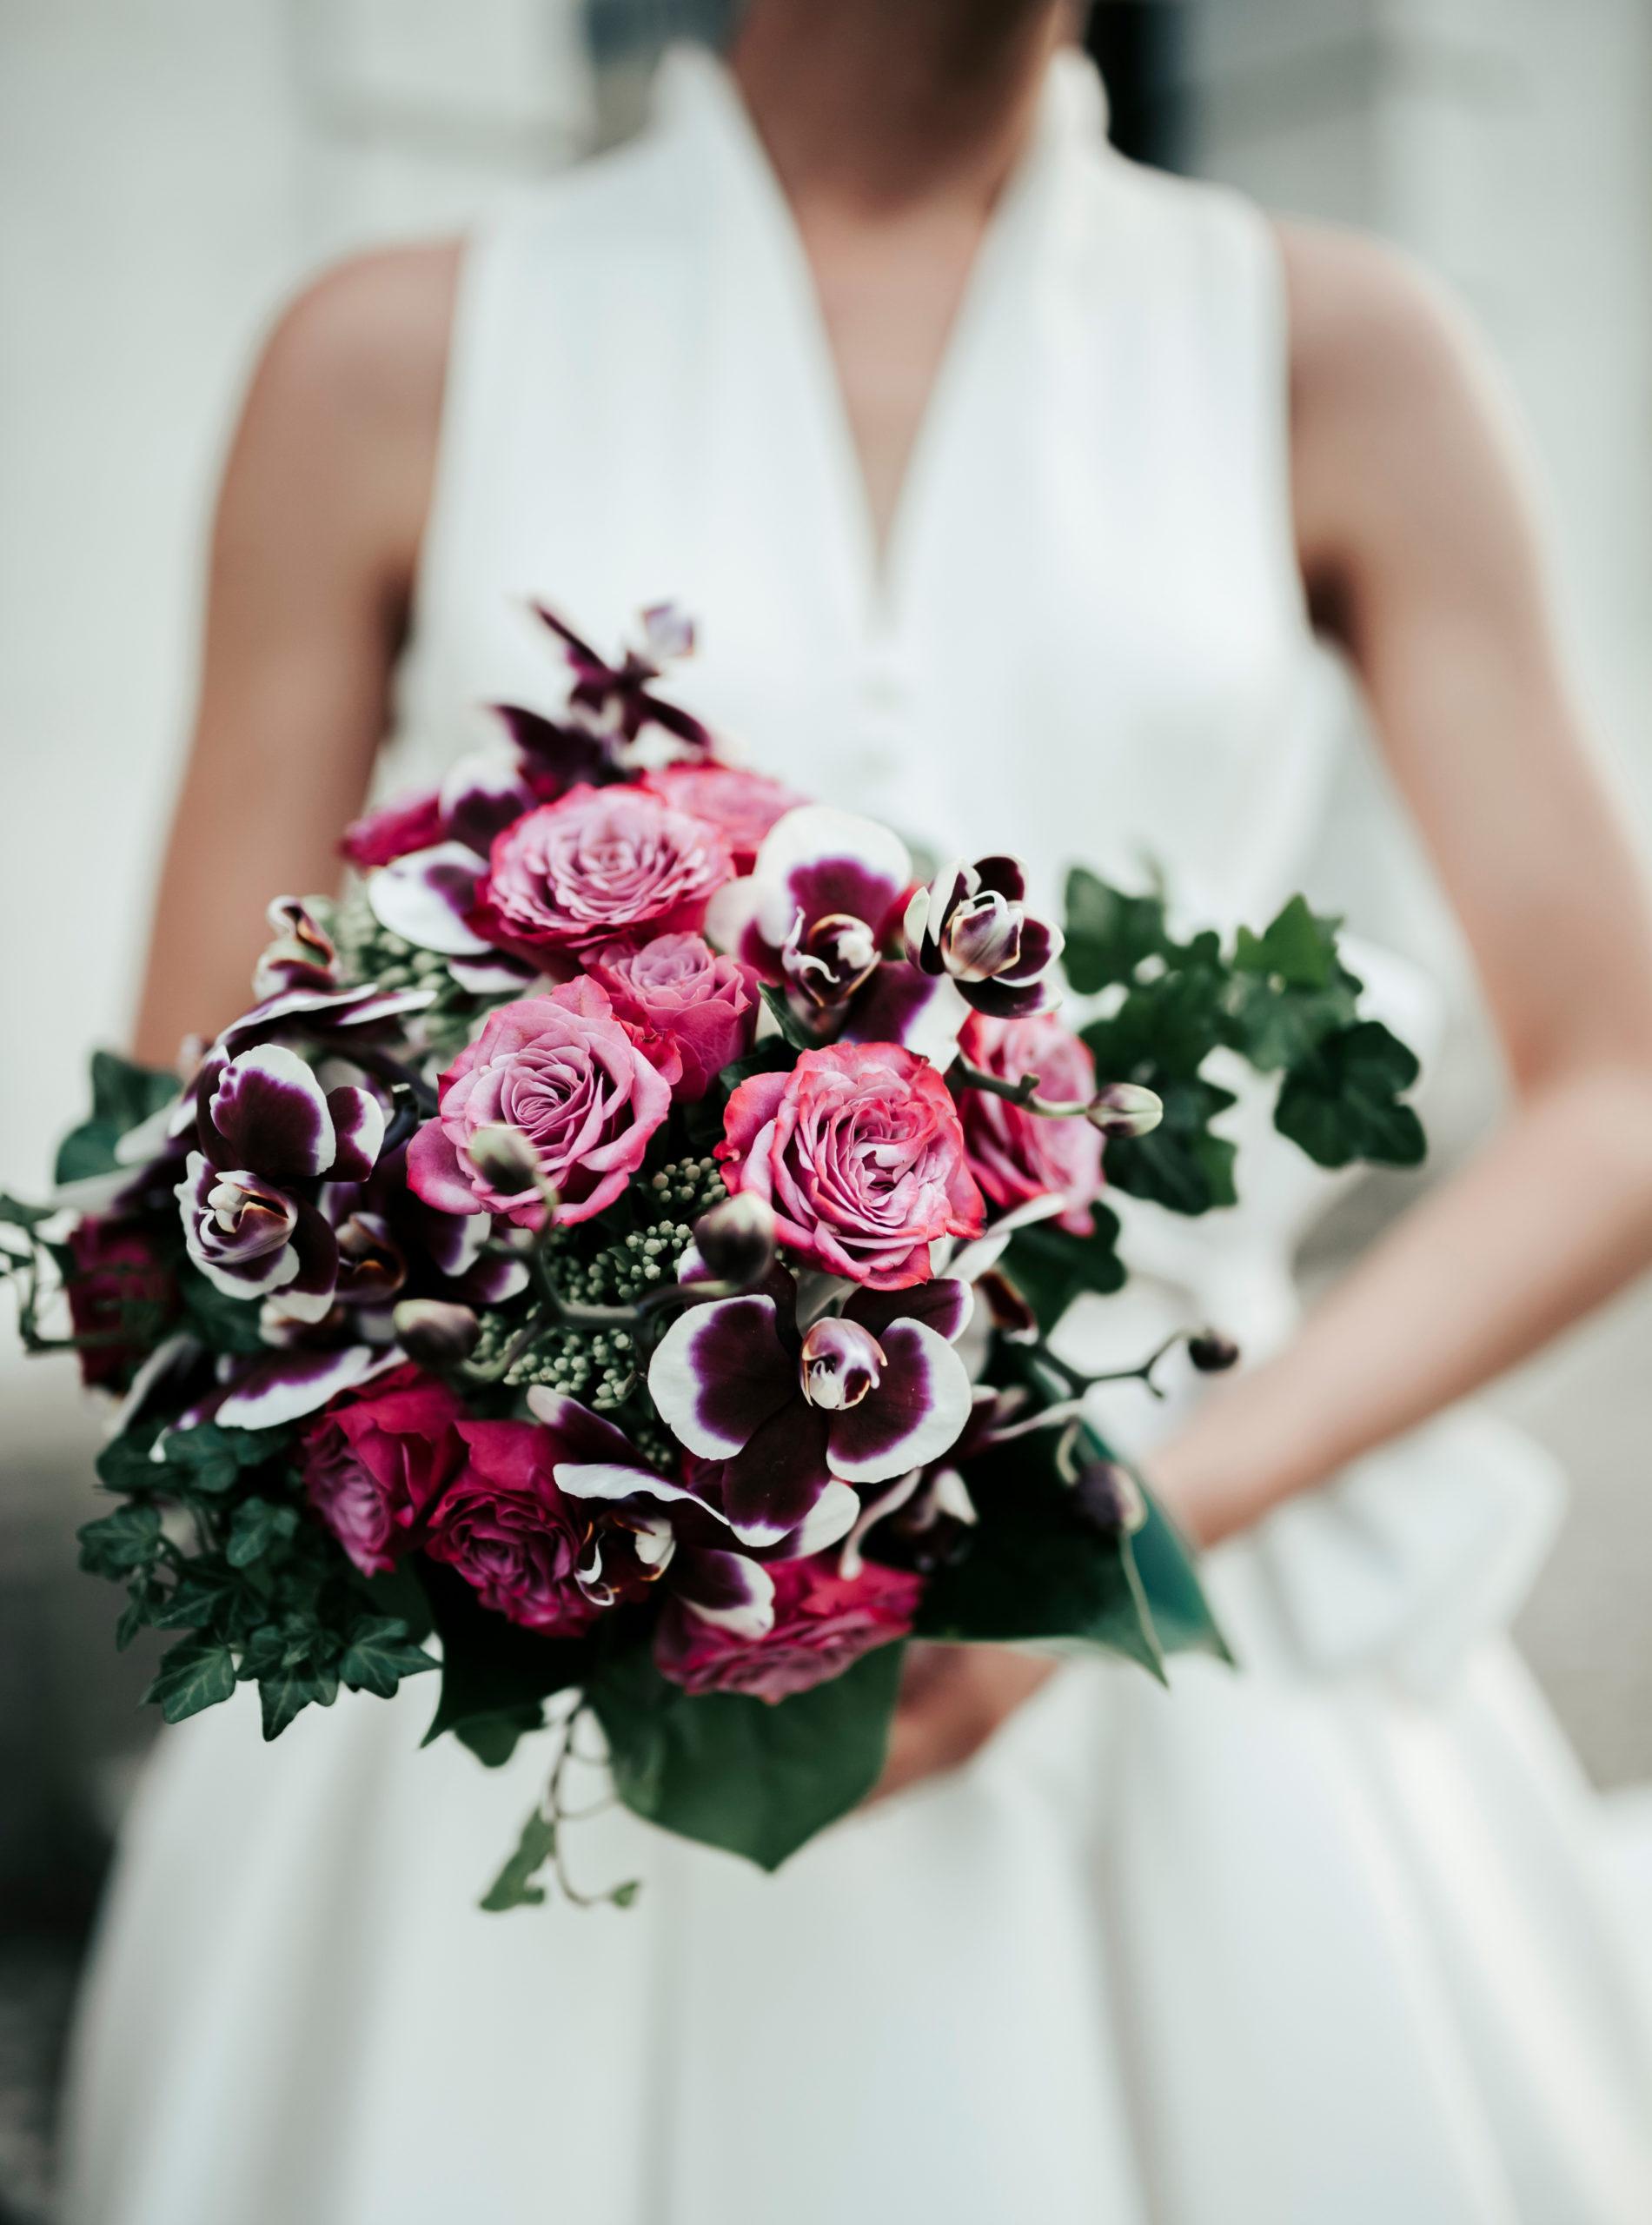 matrimonio vicenza, matrimoni vicenza, villa storica matrimonio, villa storica matrimonio